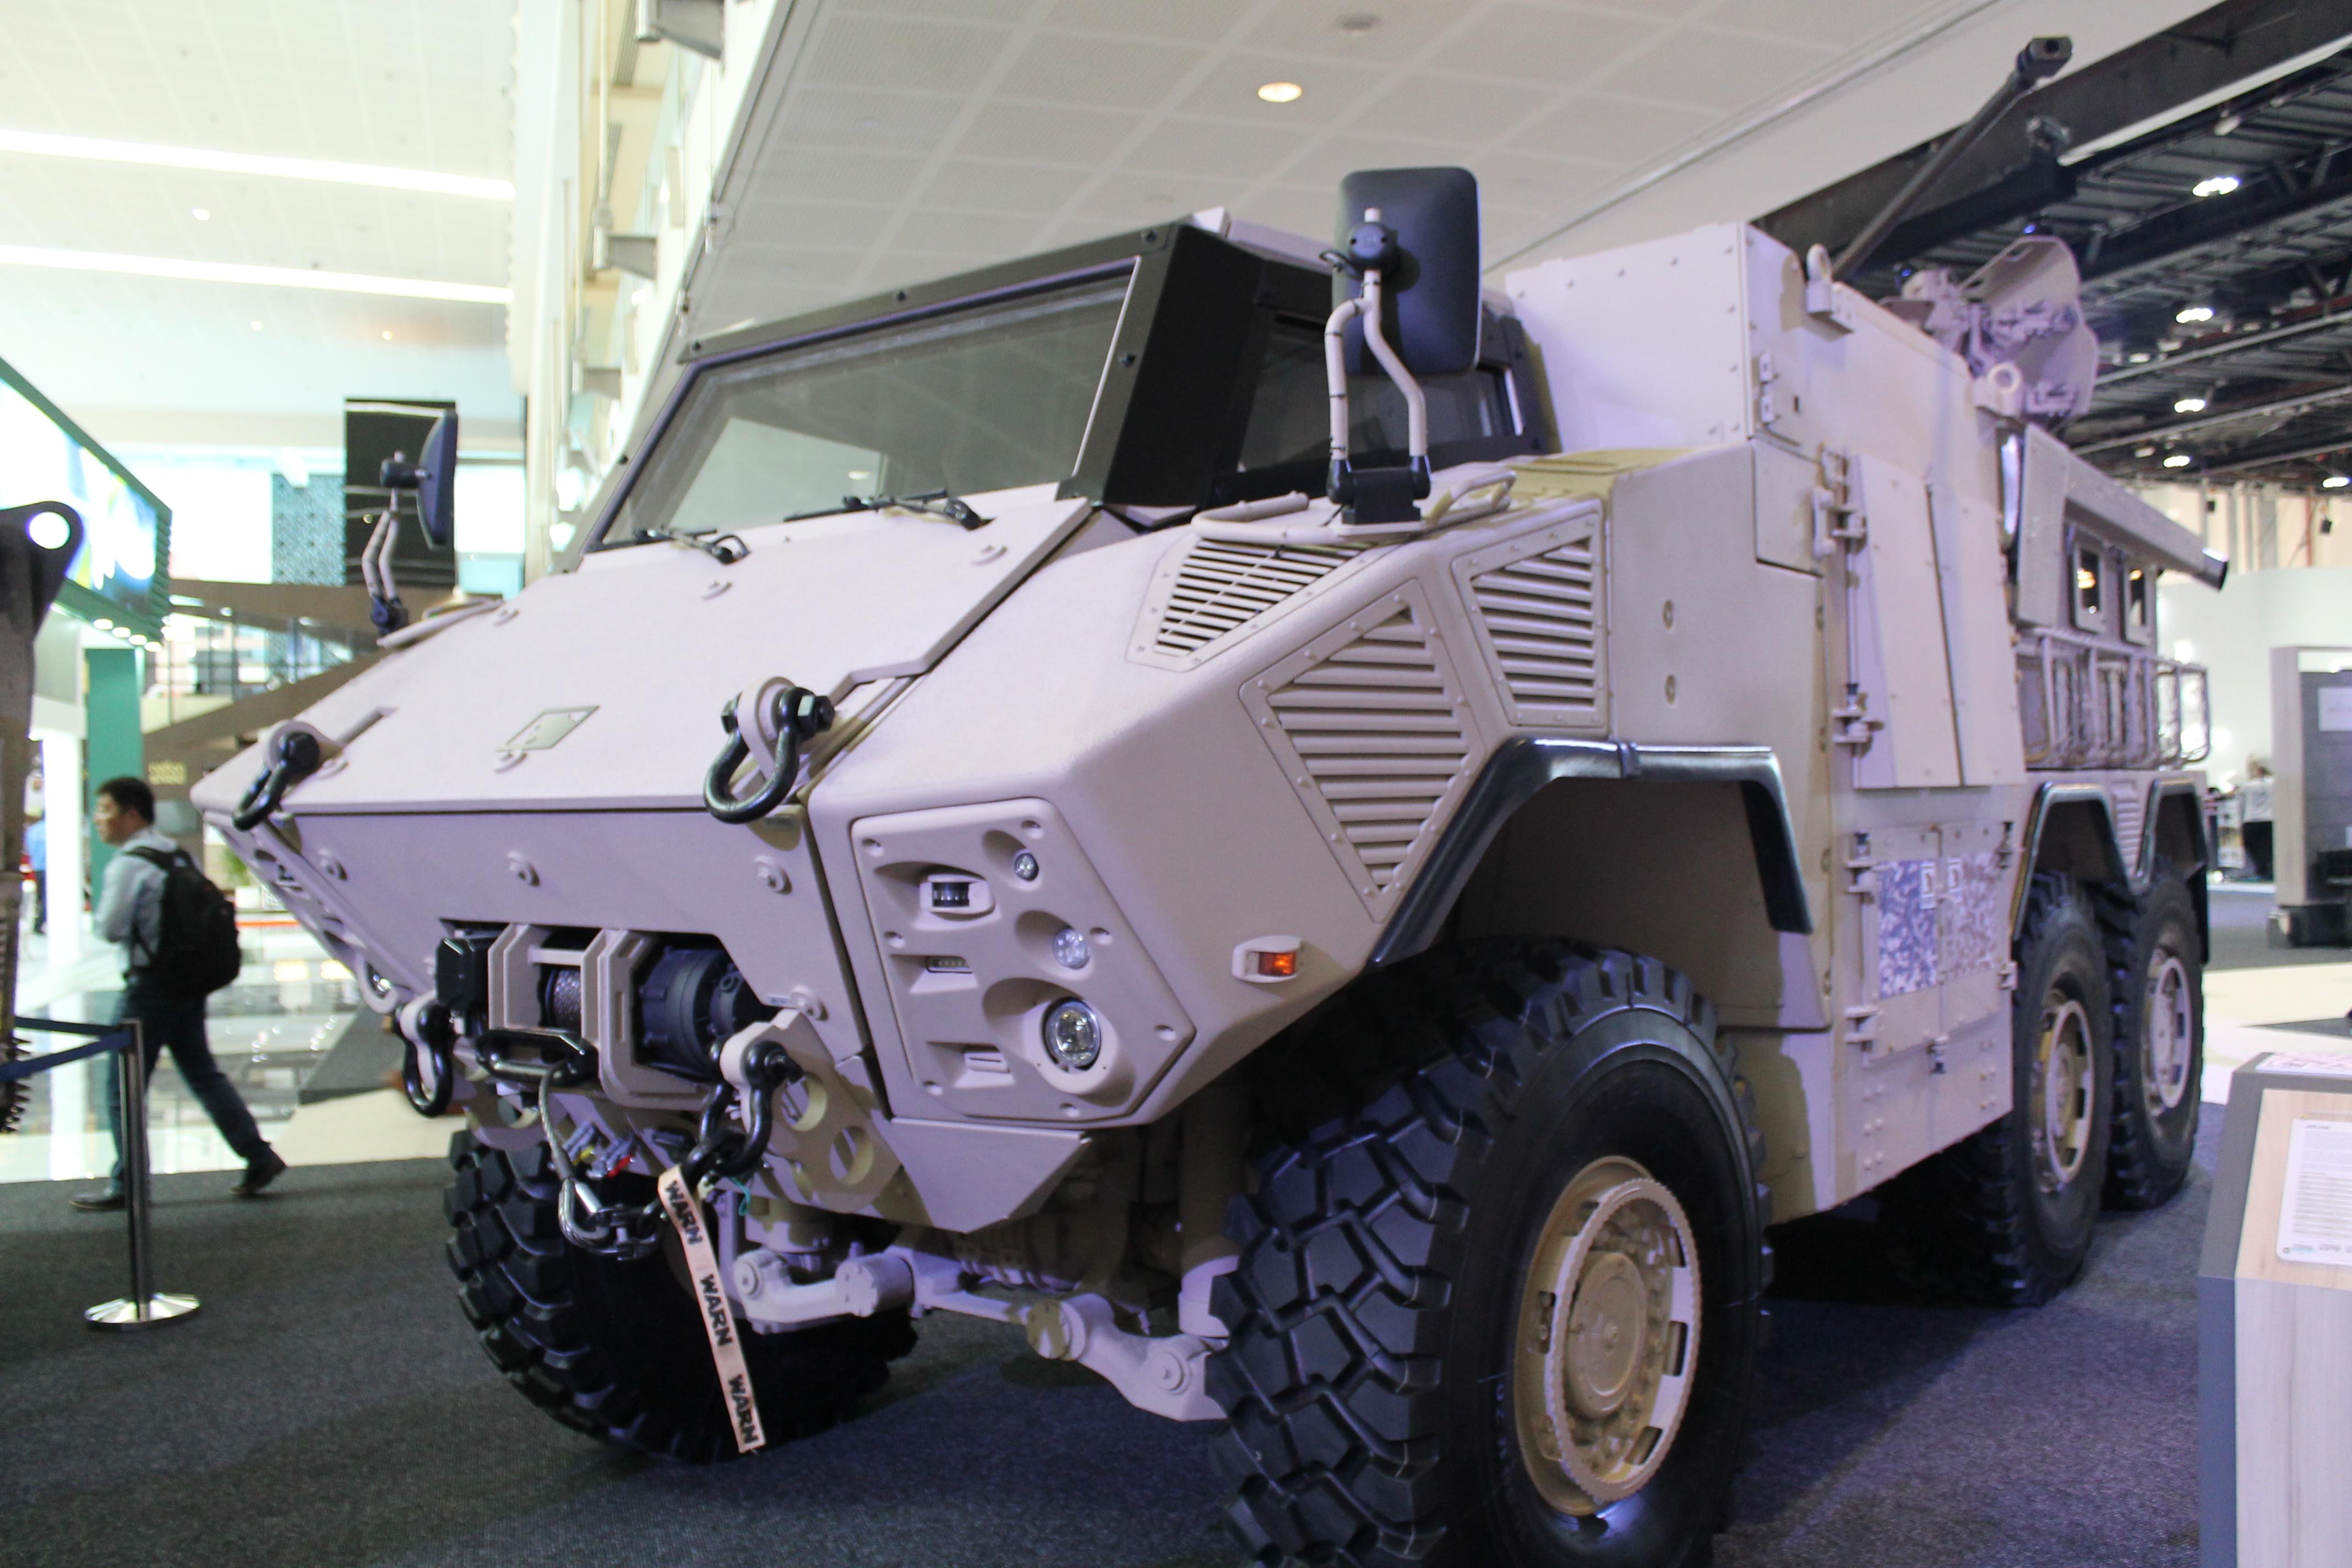 NIMR flexes manufacturing might in UAE; unveils newer, nimbler combat vehicles